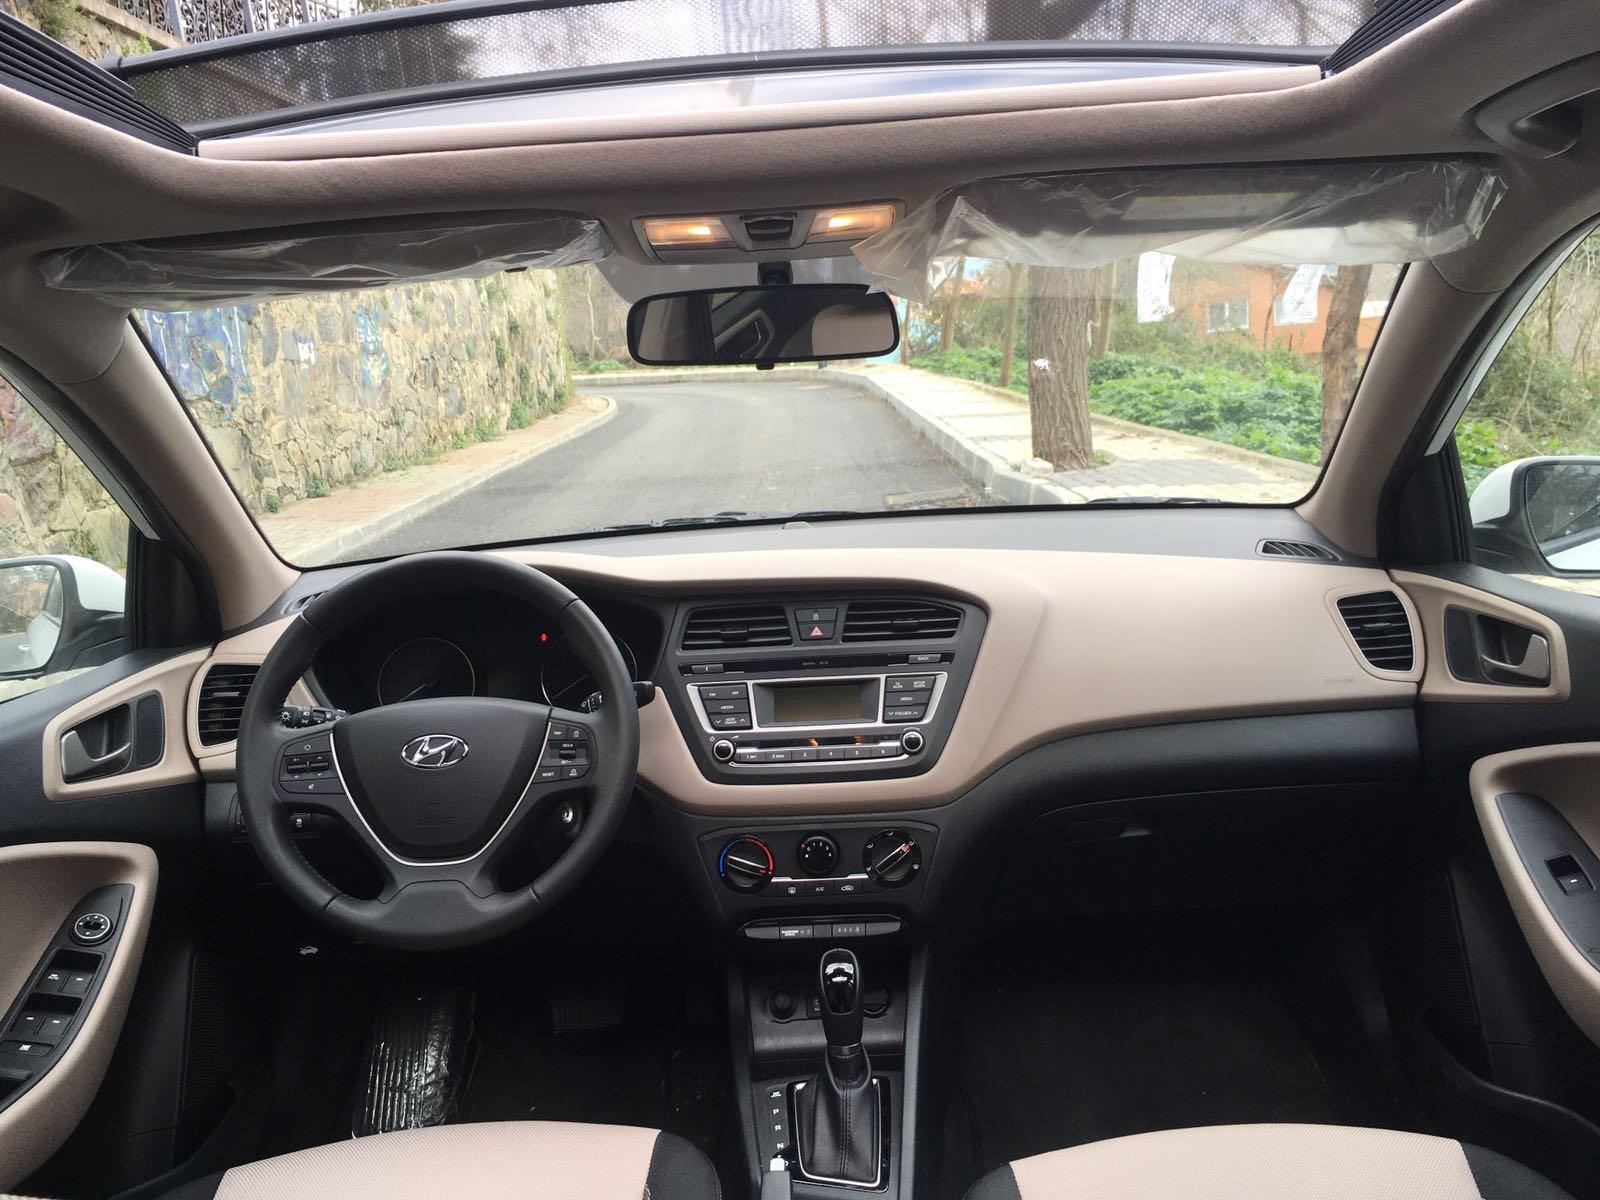 HYUNDAI i20 2017 Model Benzin Otomatik Vites Kiralik Araç - 1711